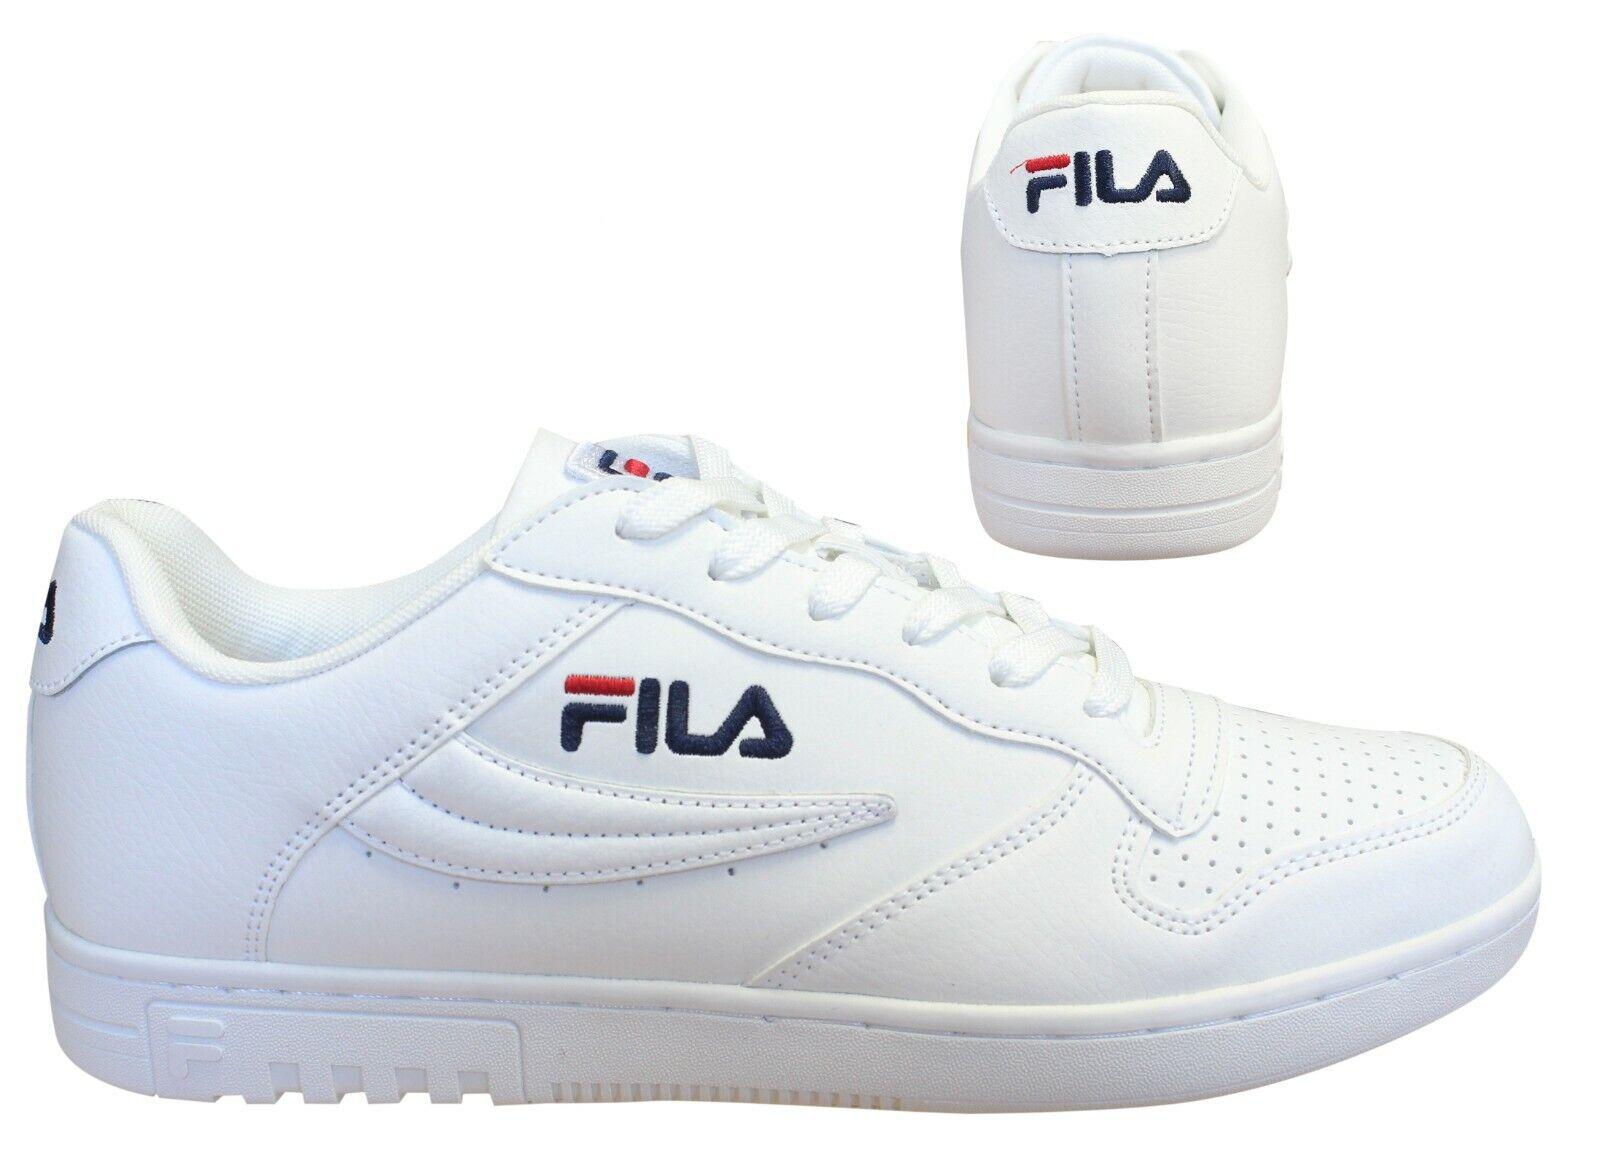 1010260 herren Sports Casual Up Lace Weiß Low FX 100 Fila